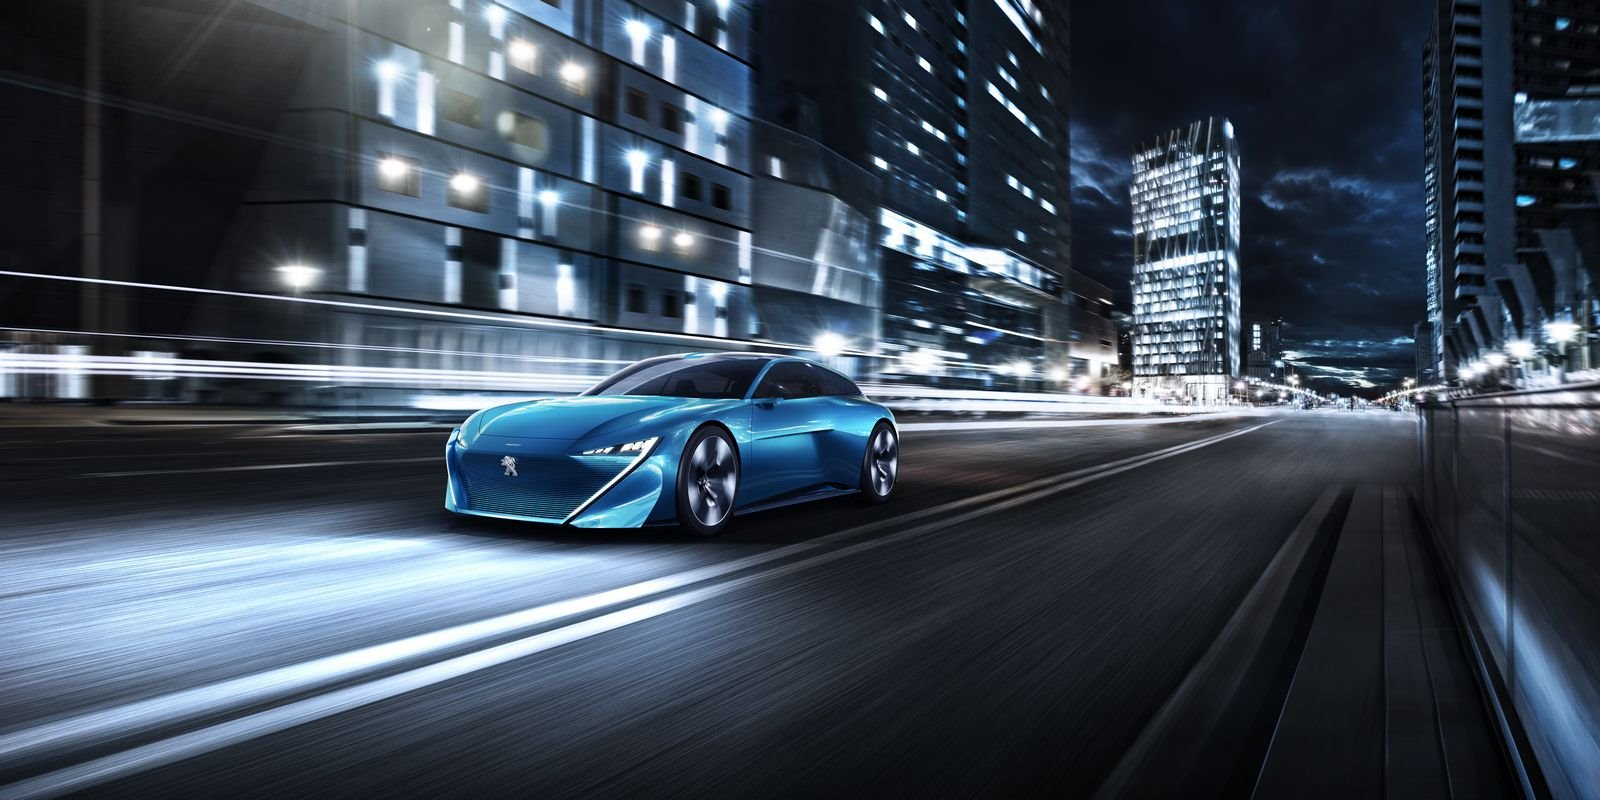 2017-Peugeot-Instinct-Concept-17